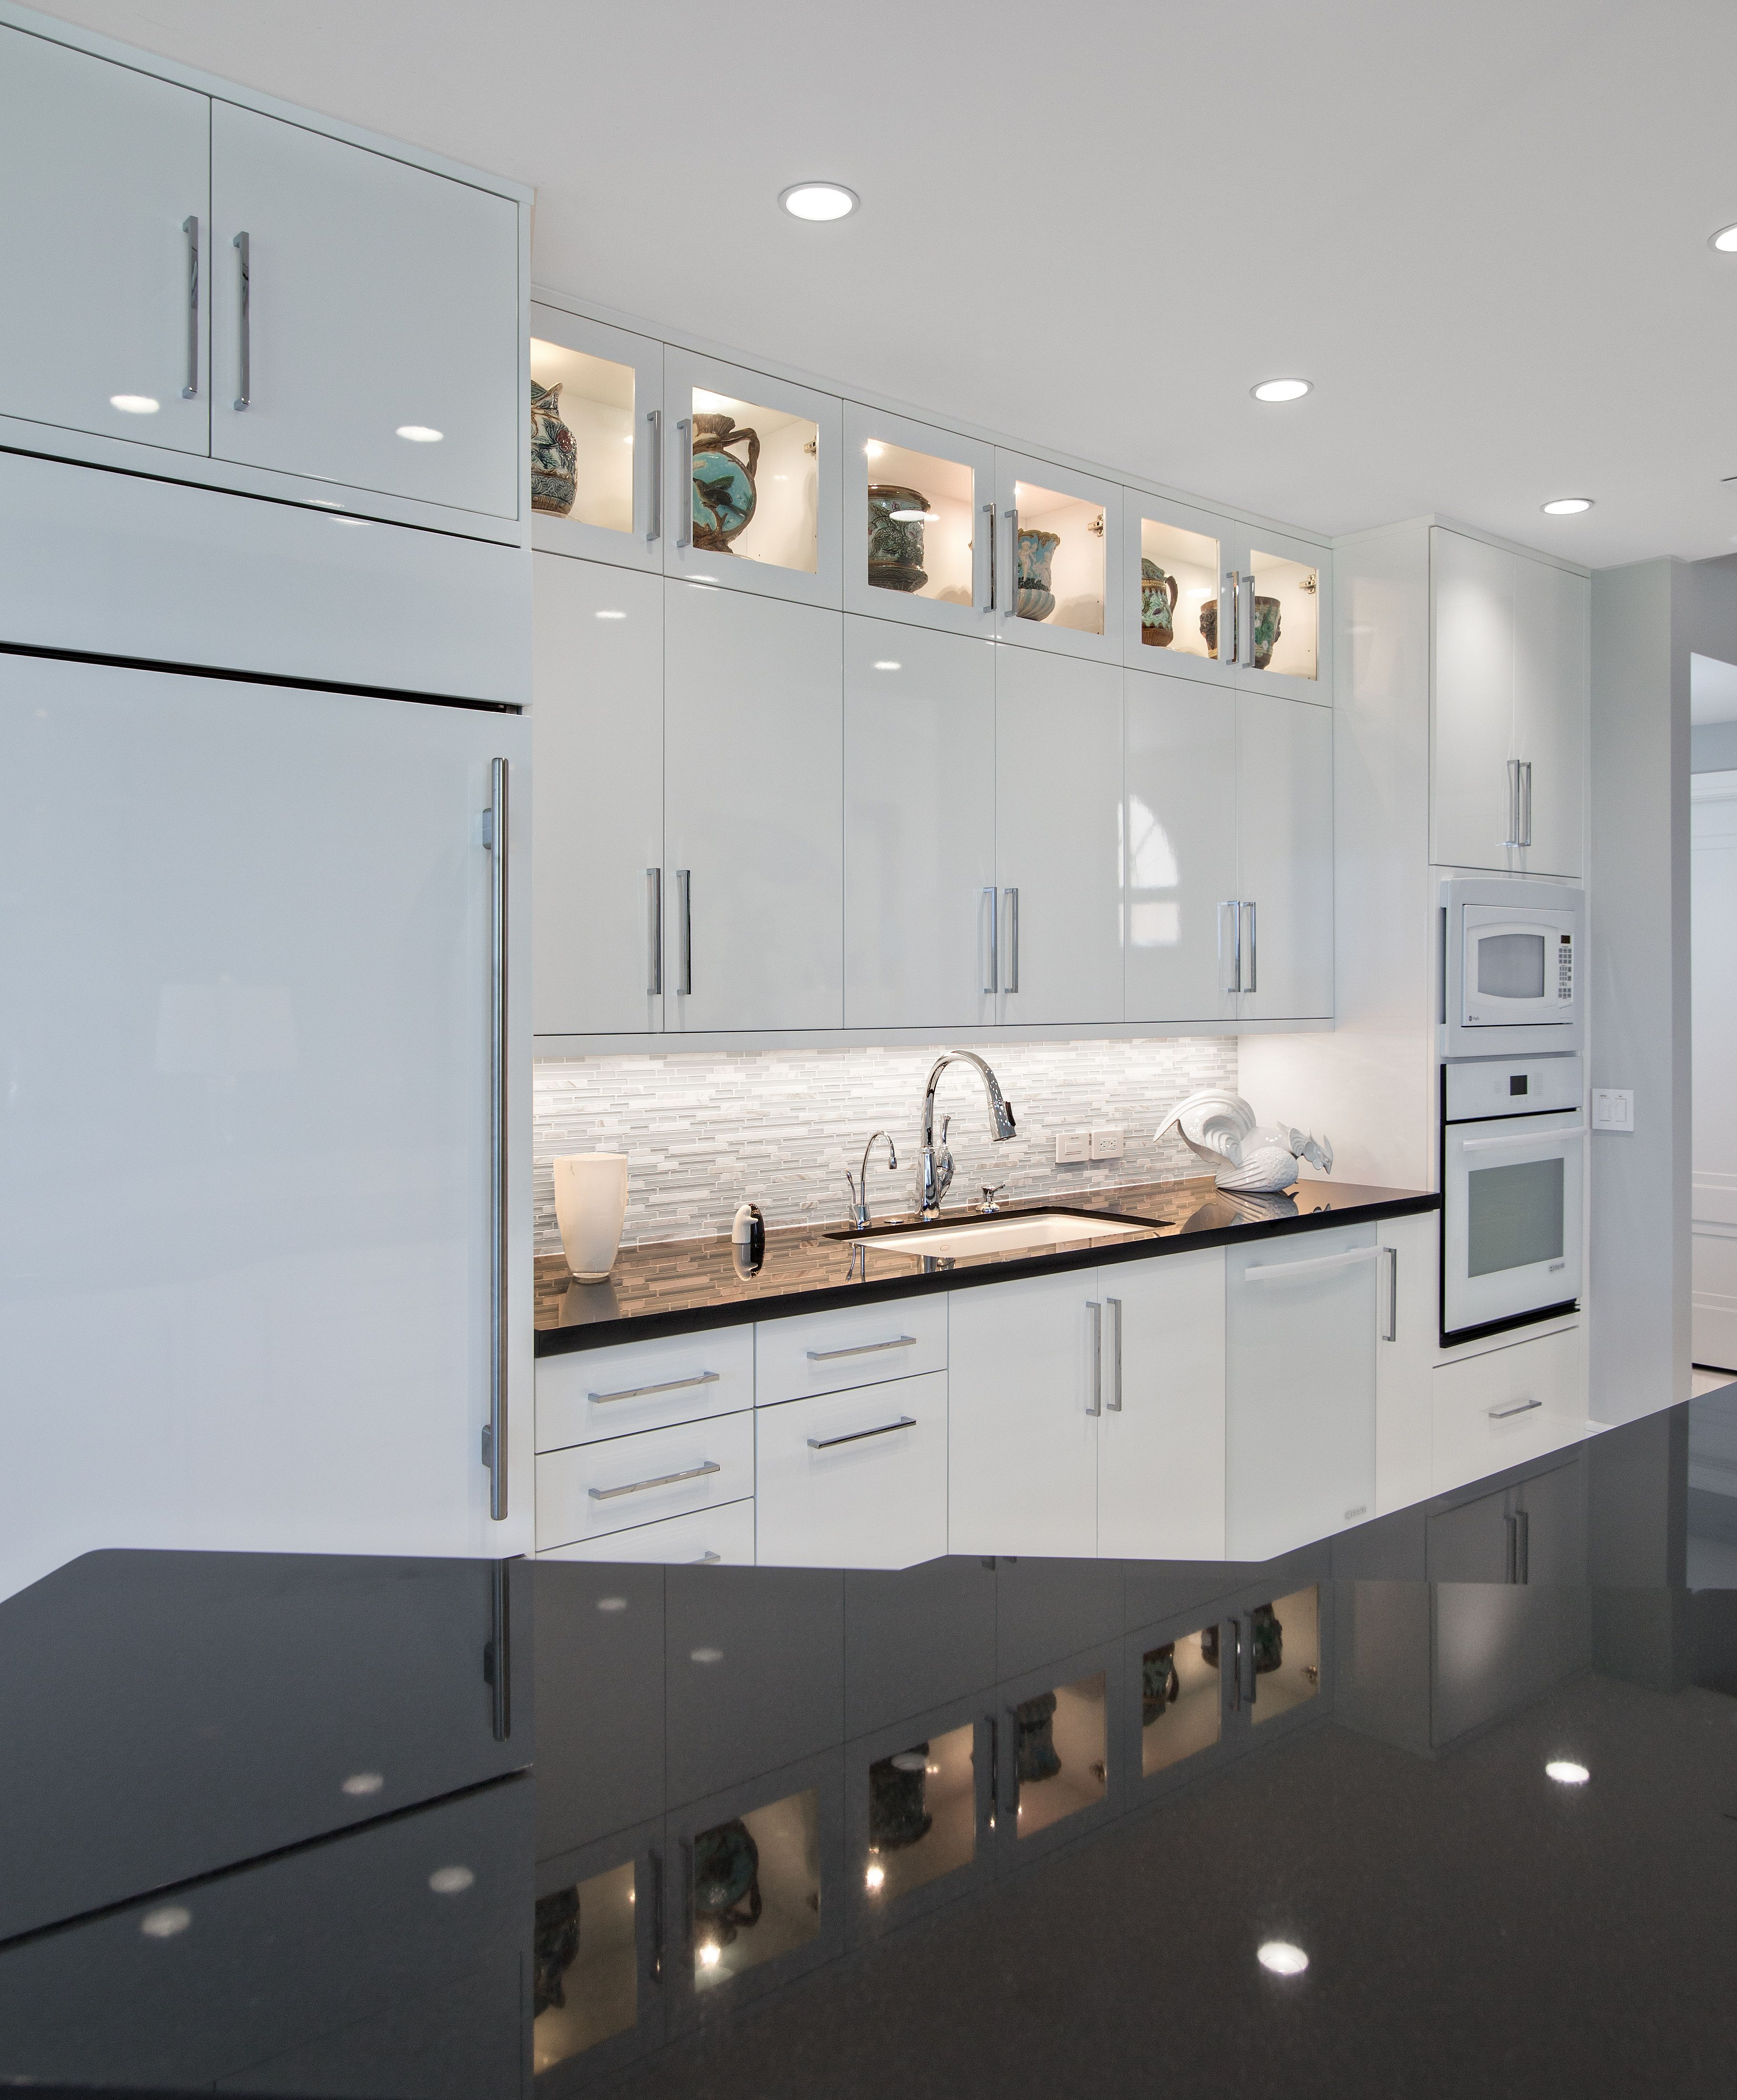 Kitchen Remodel Ventura: Boxer Residence Jupiter, FL Elmwood Cabinetry Ventura Door